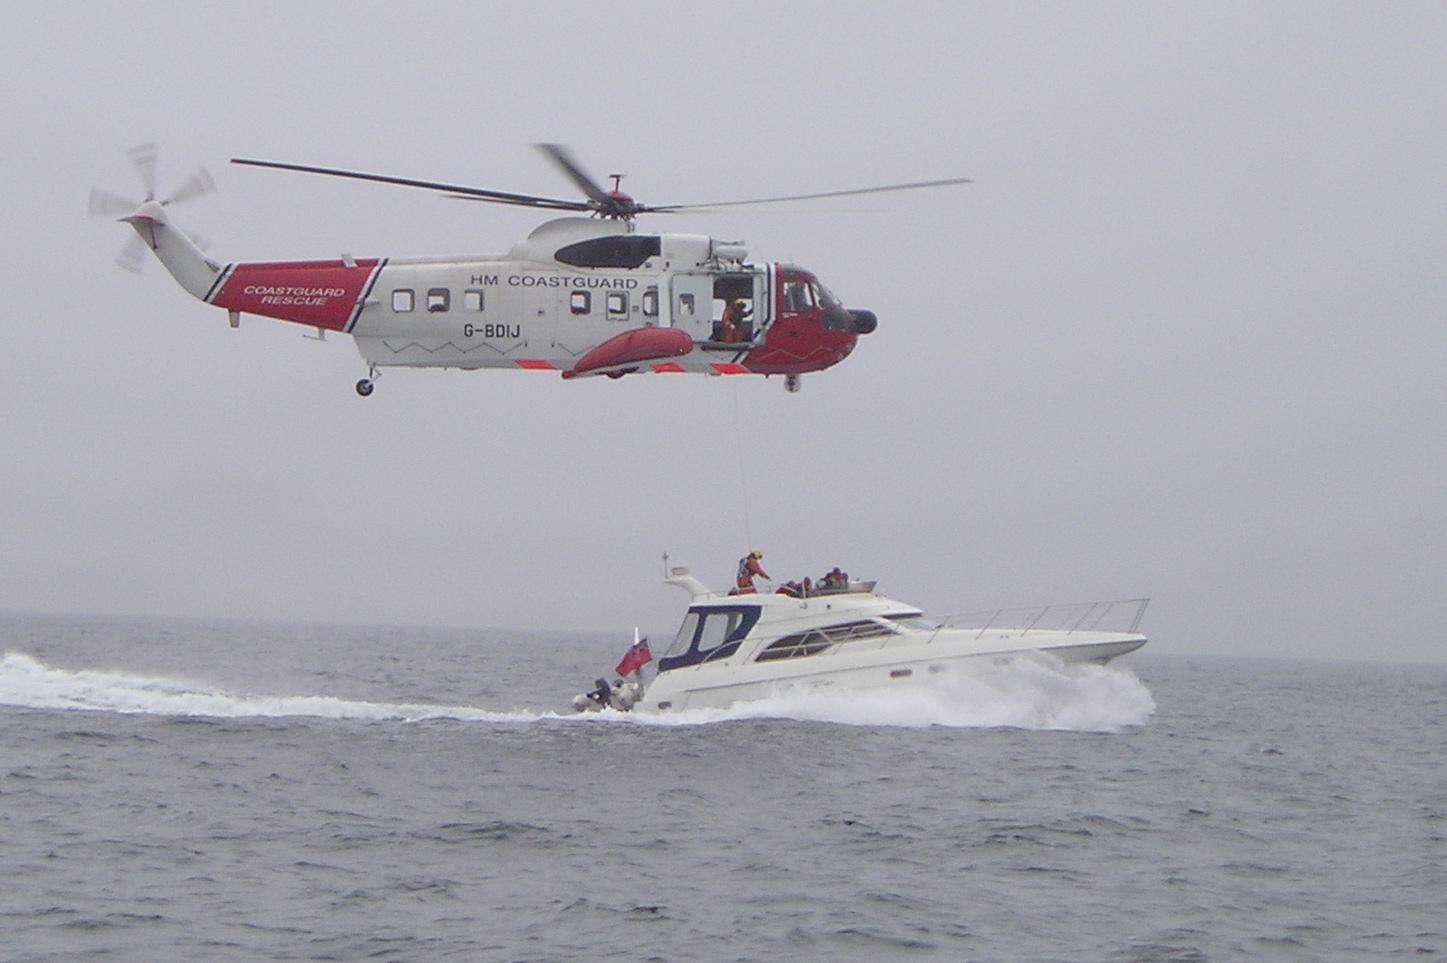 Sealine F43 Good Boat  Bad Boat